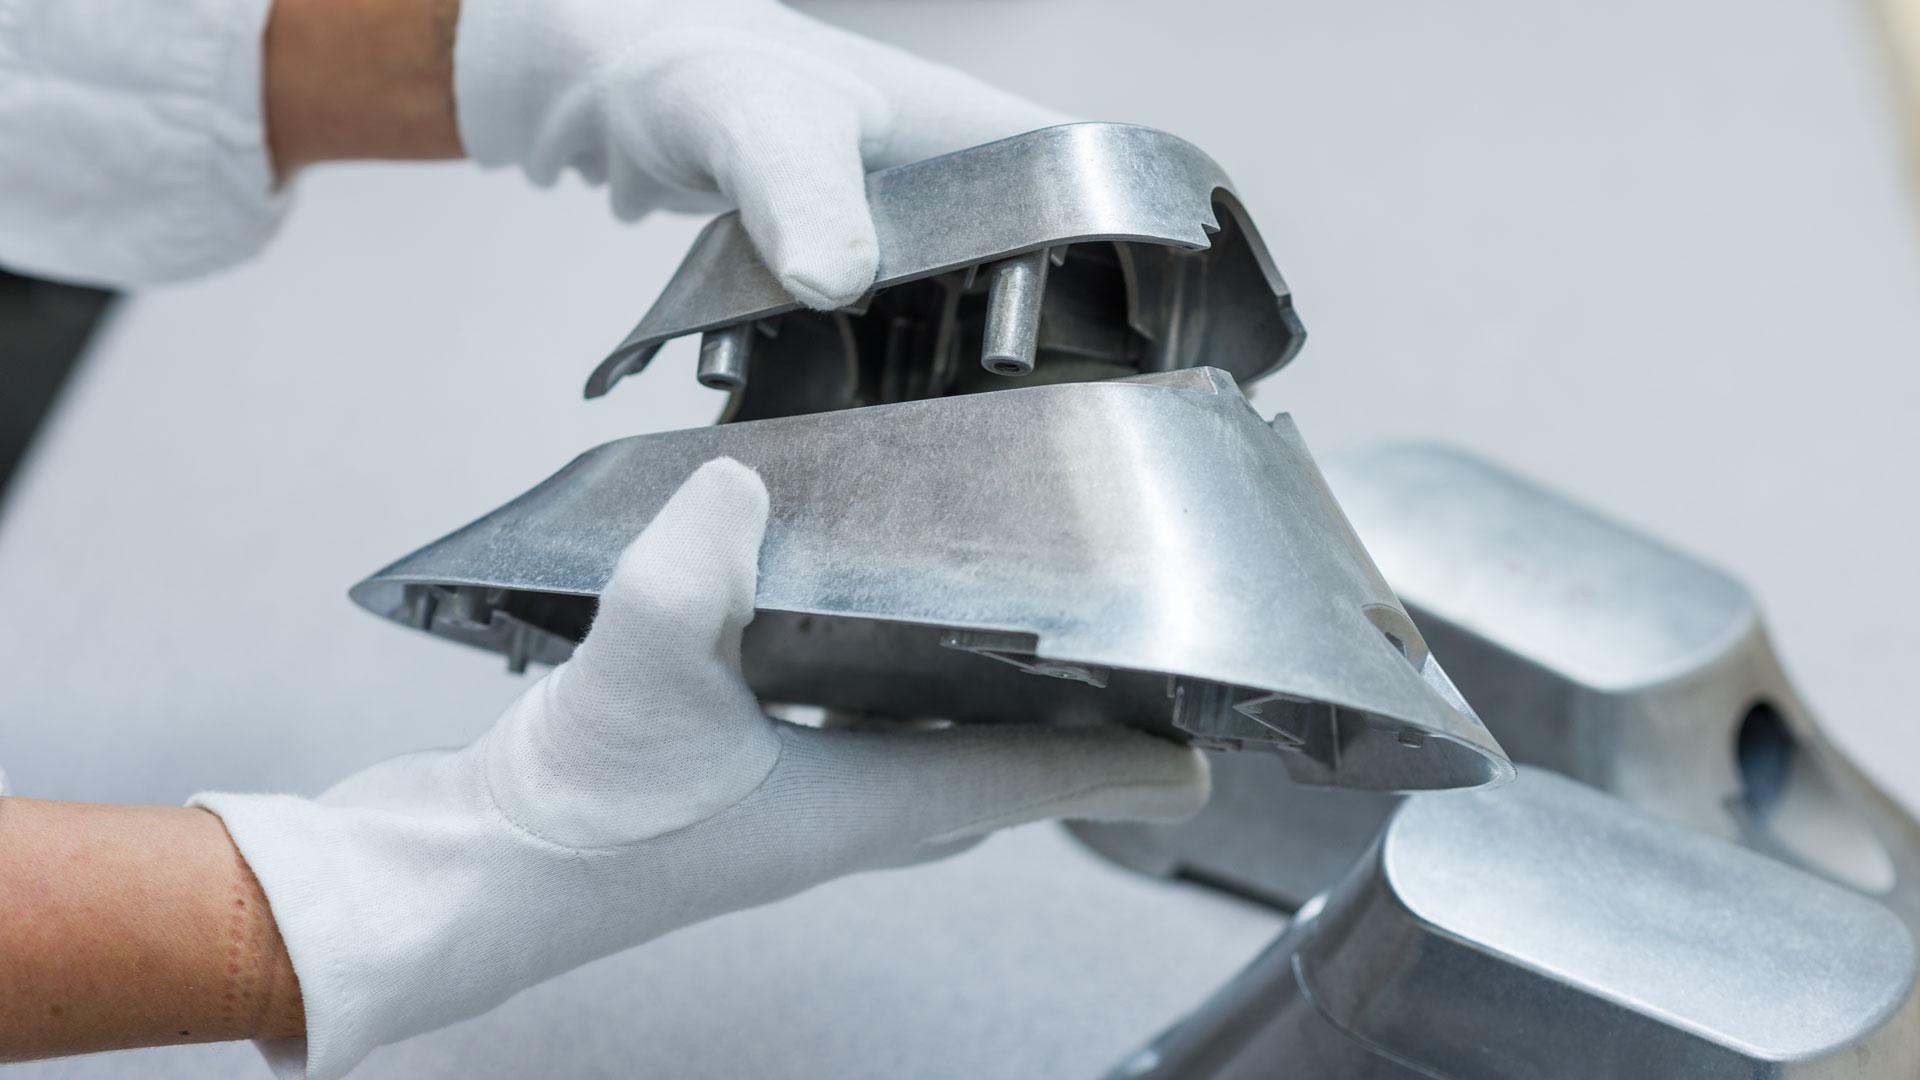 Installation of cast parts